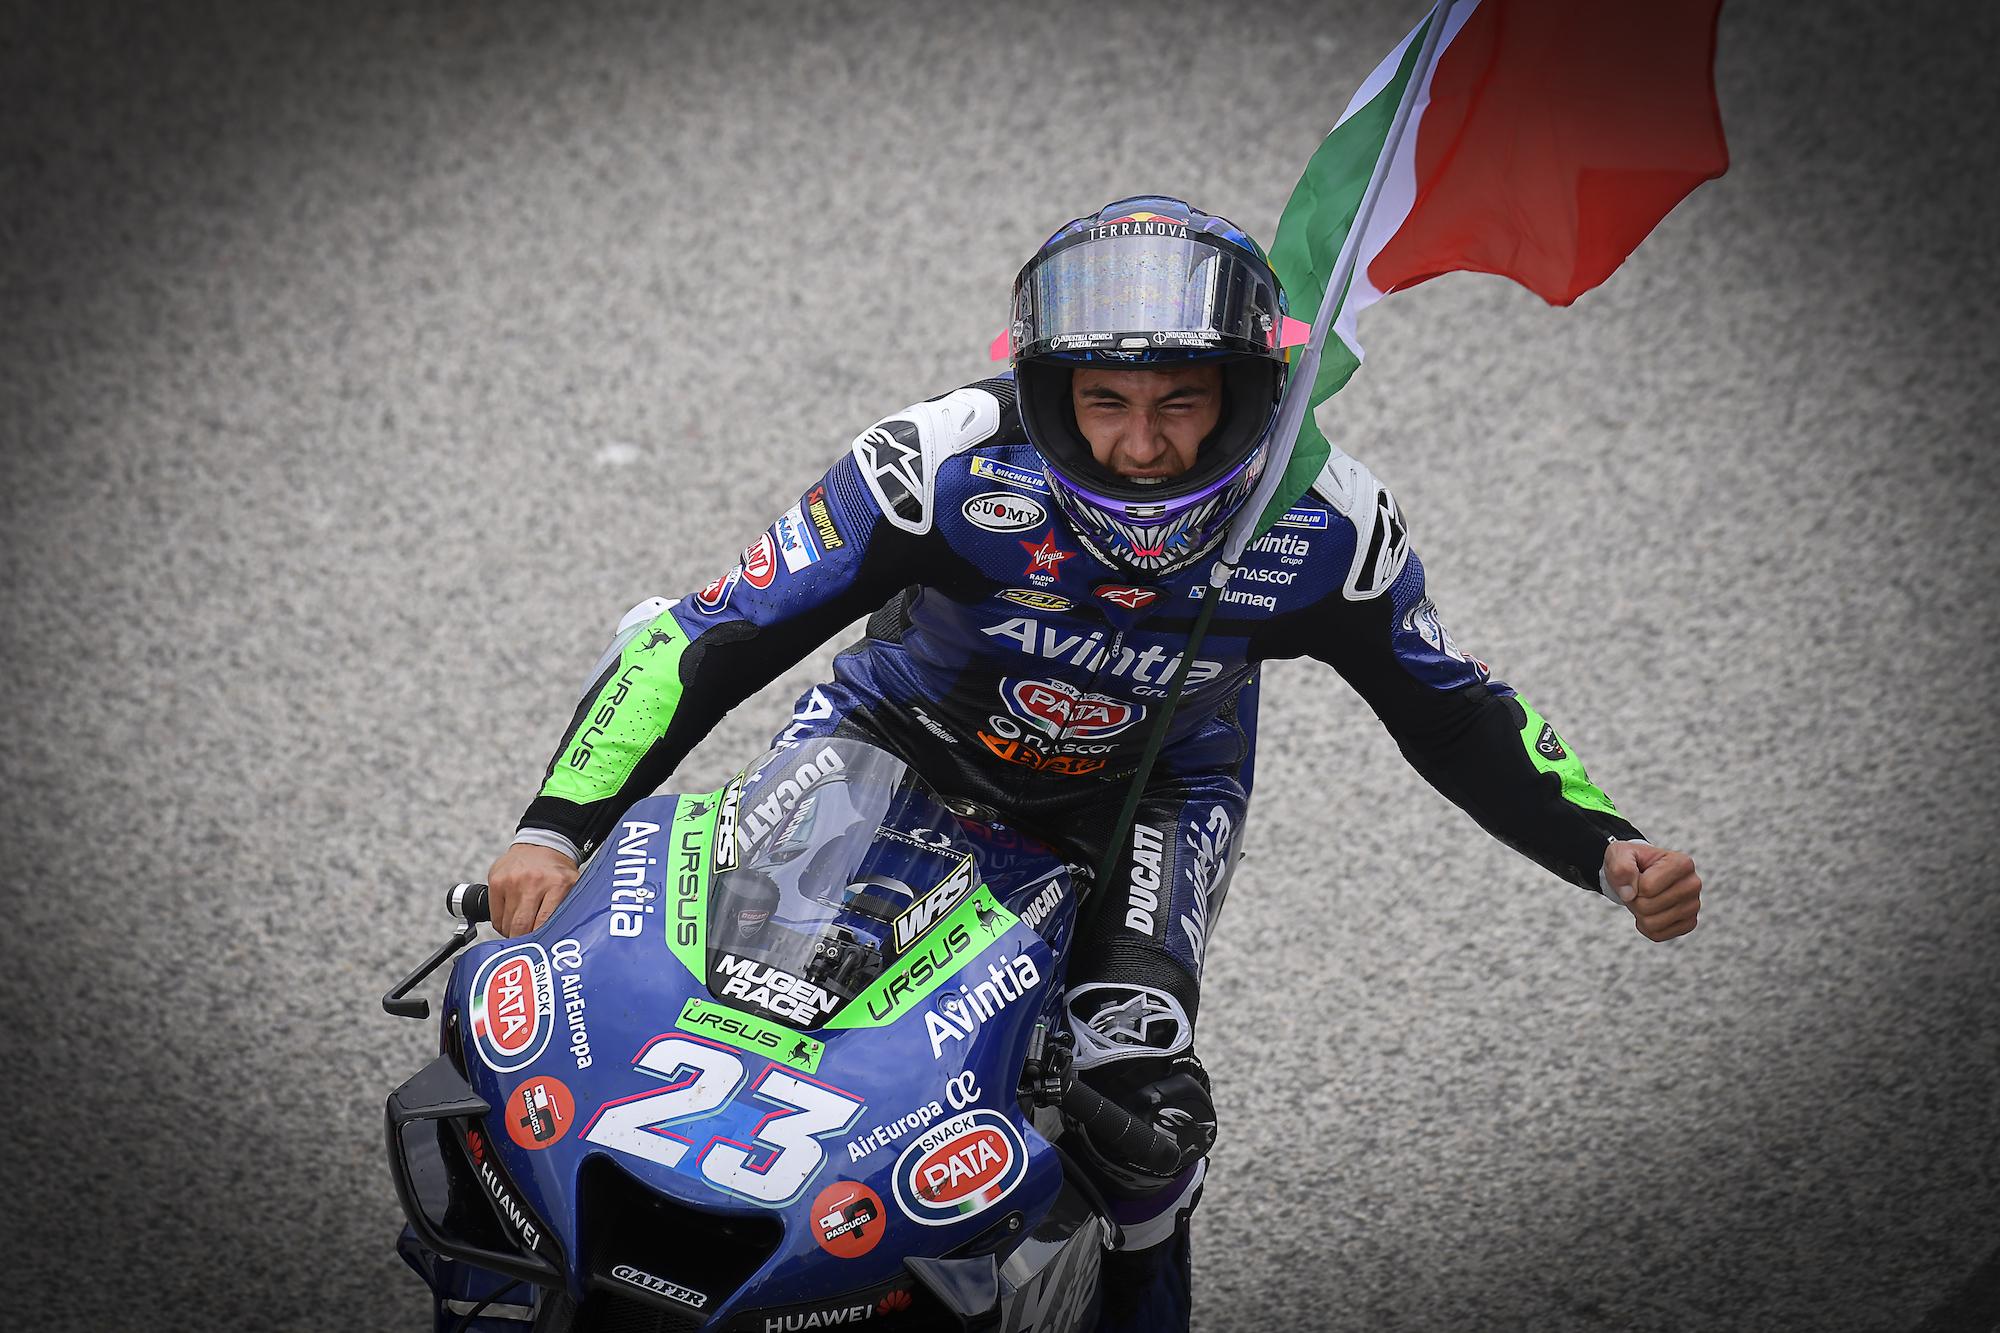 Enea Bastianini podczas GP San Marino 2021 w Misano